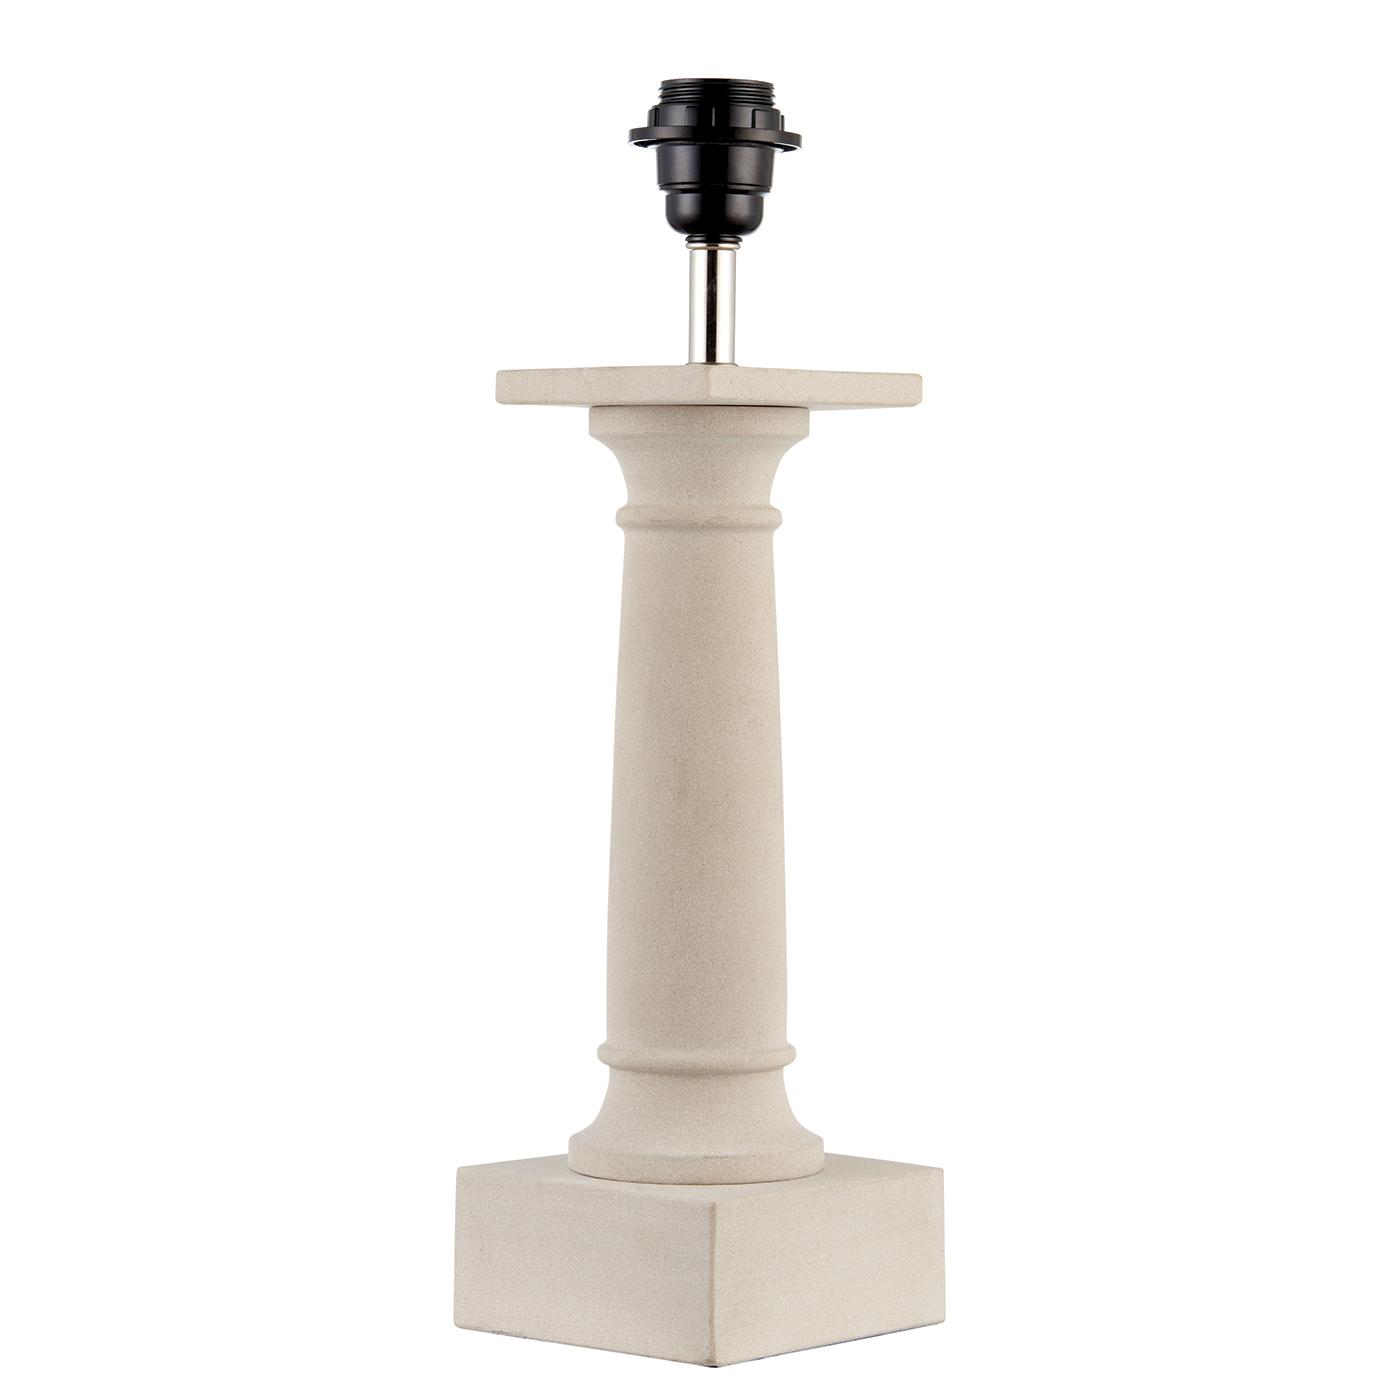 Endon 69810 Pompey Table Lamp 40W